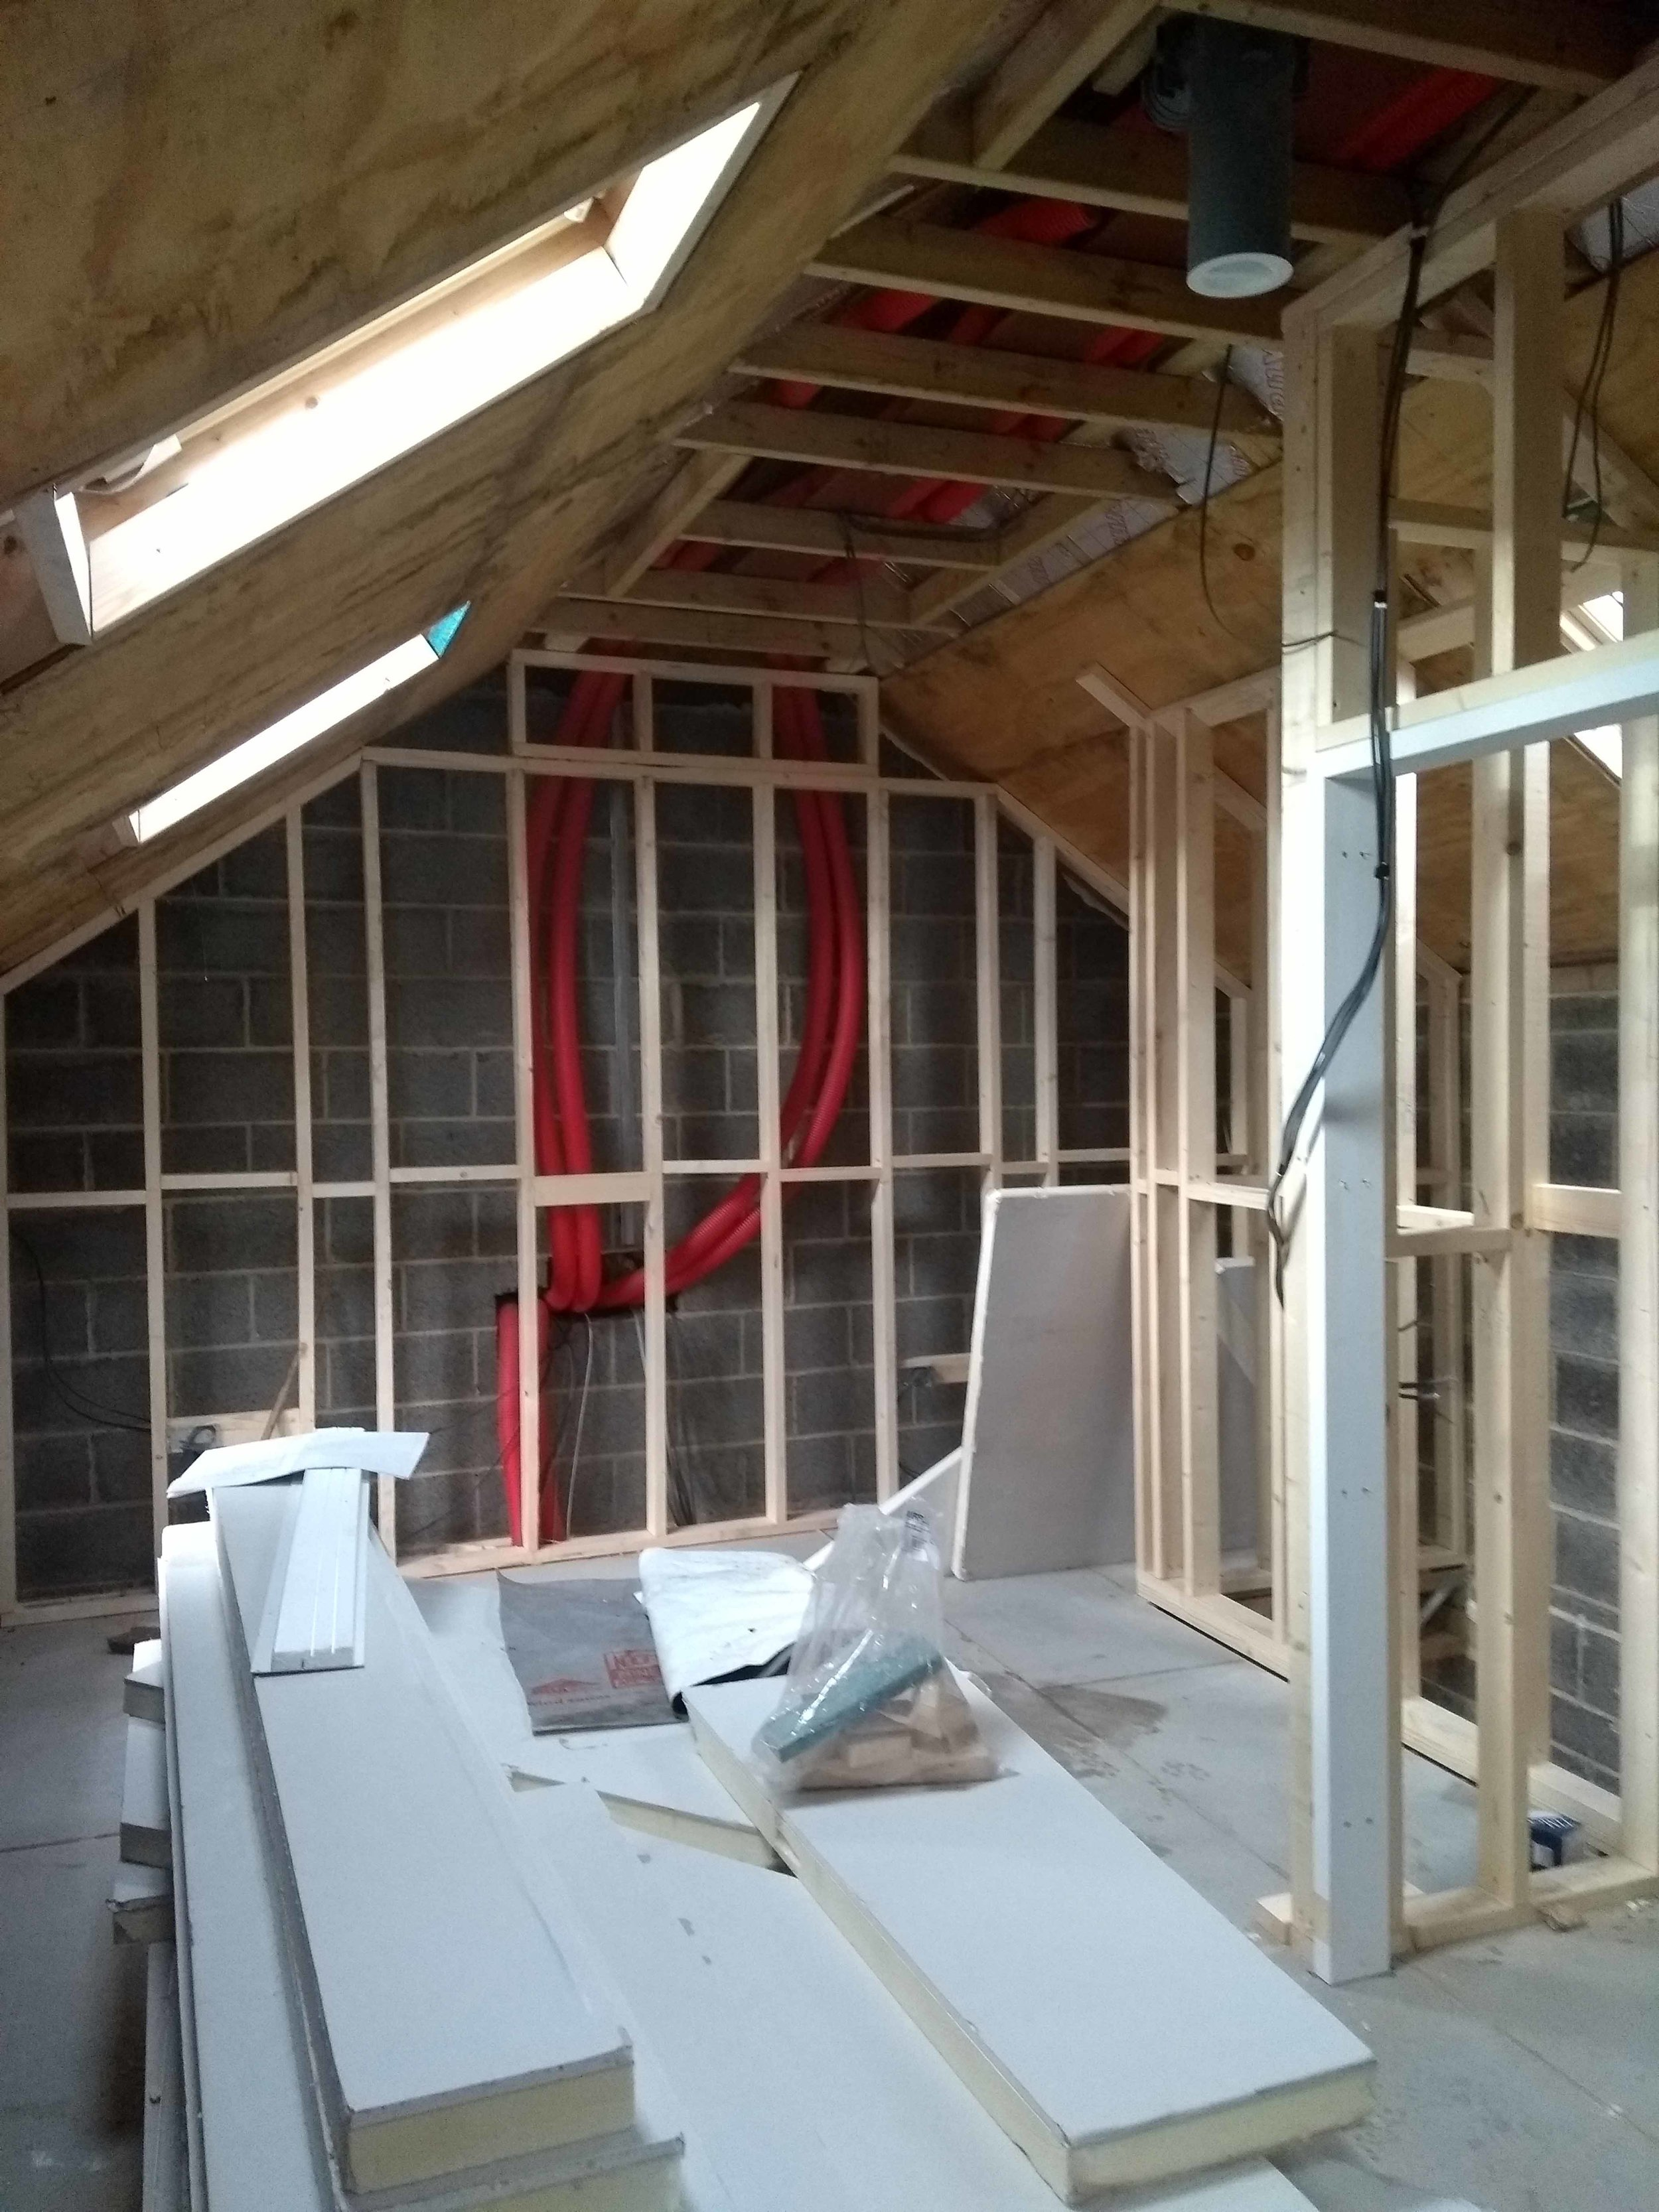 Bedroom before plaster board